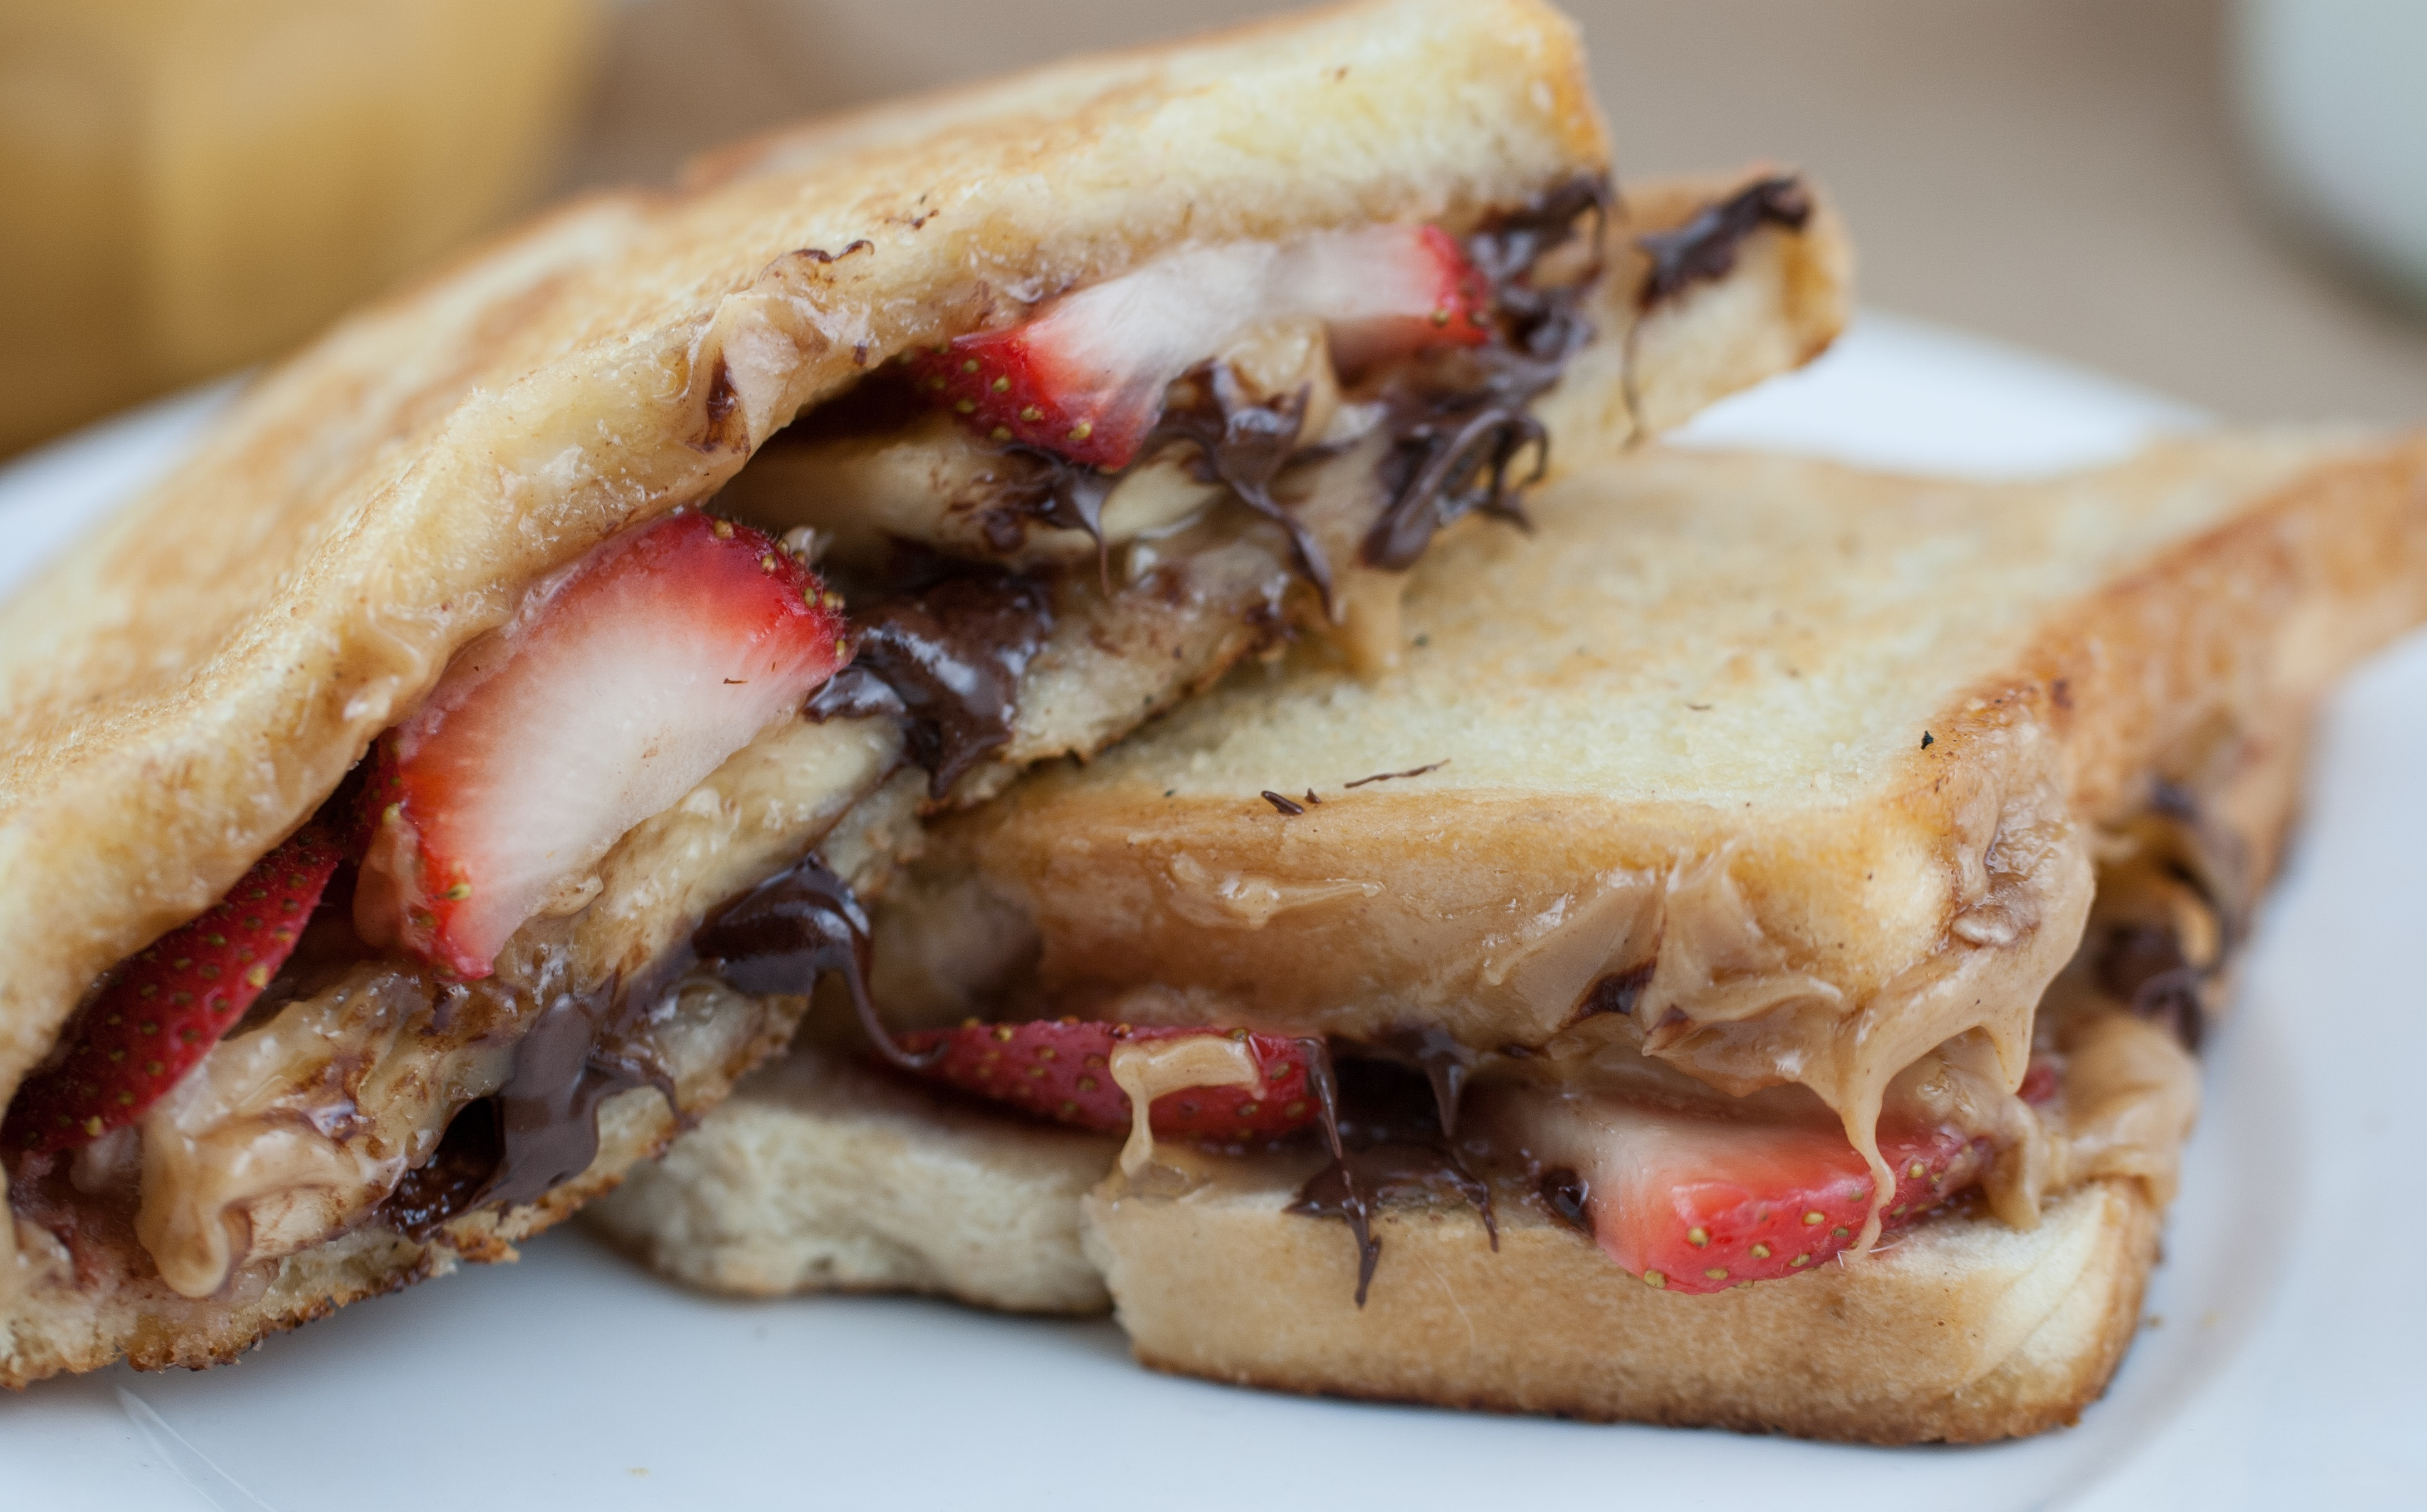 sandwich chocolate plátano y fresas